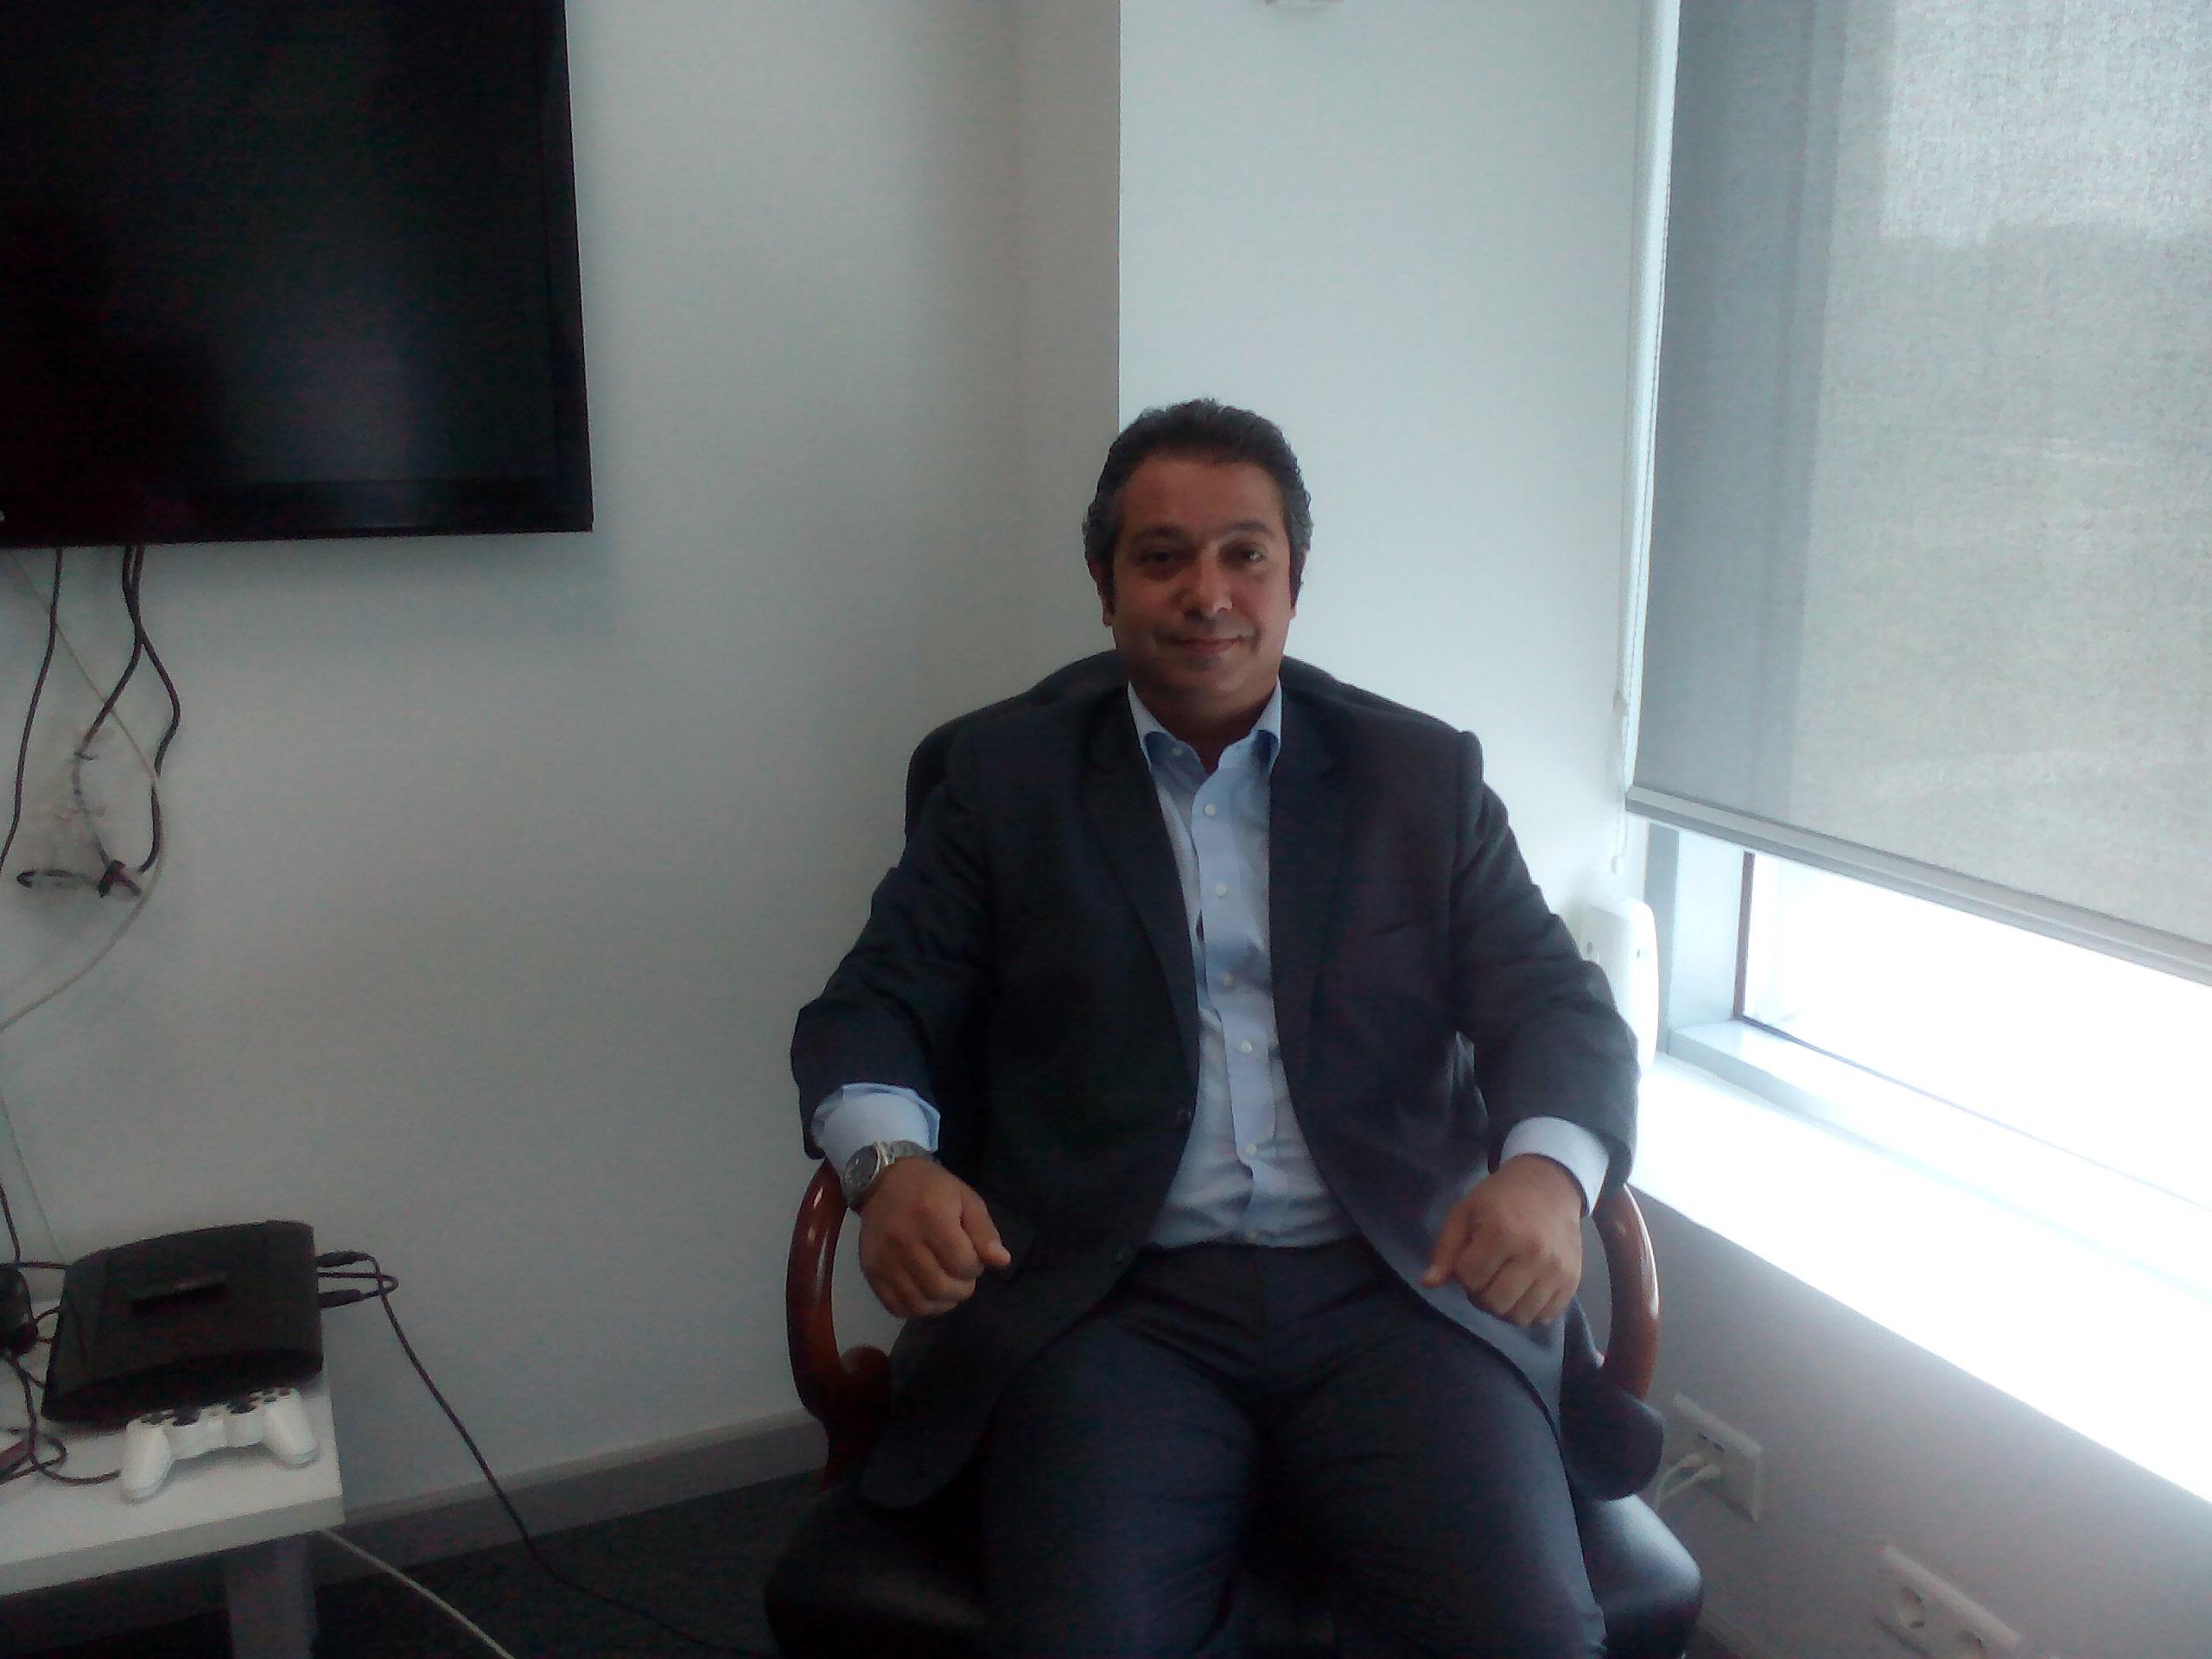 Hashem Monsi, CEO of Dell. (DNE Photo)